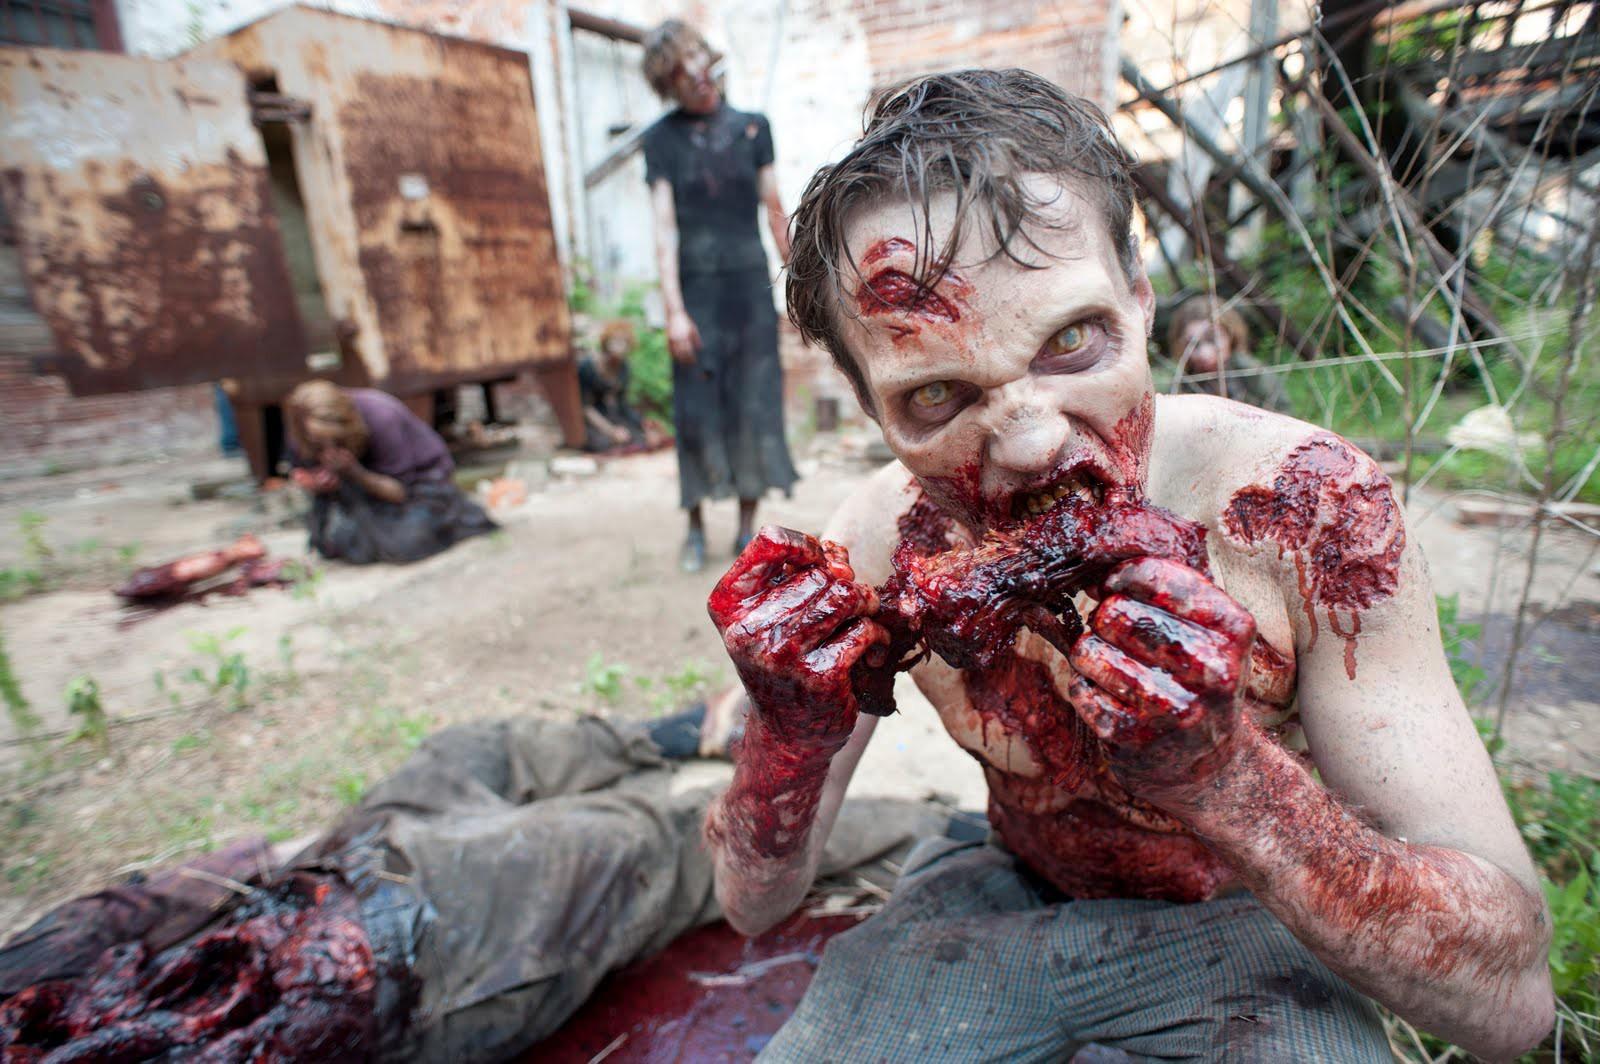 zombies eating meat - Bana istediğim resmi yolla